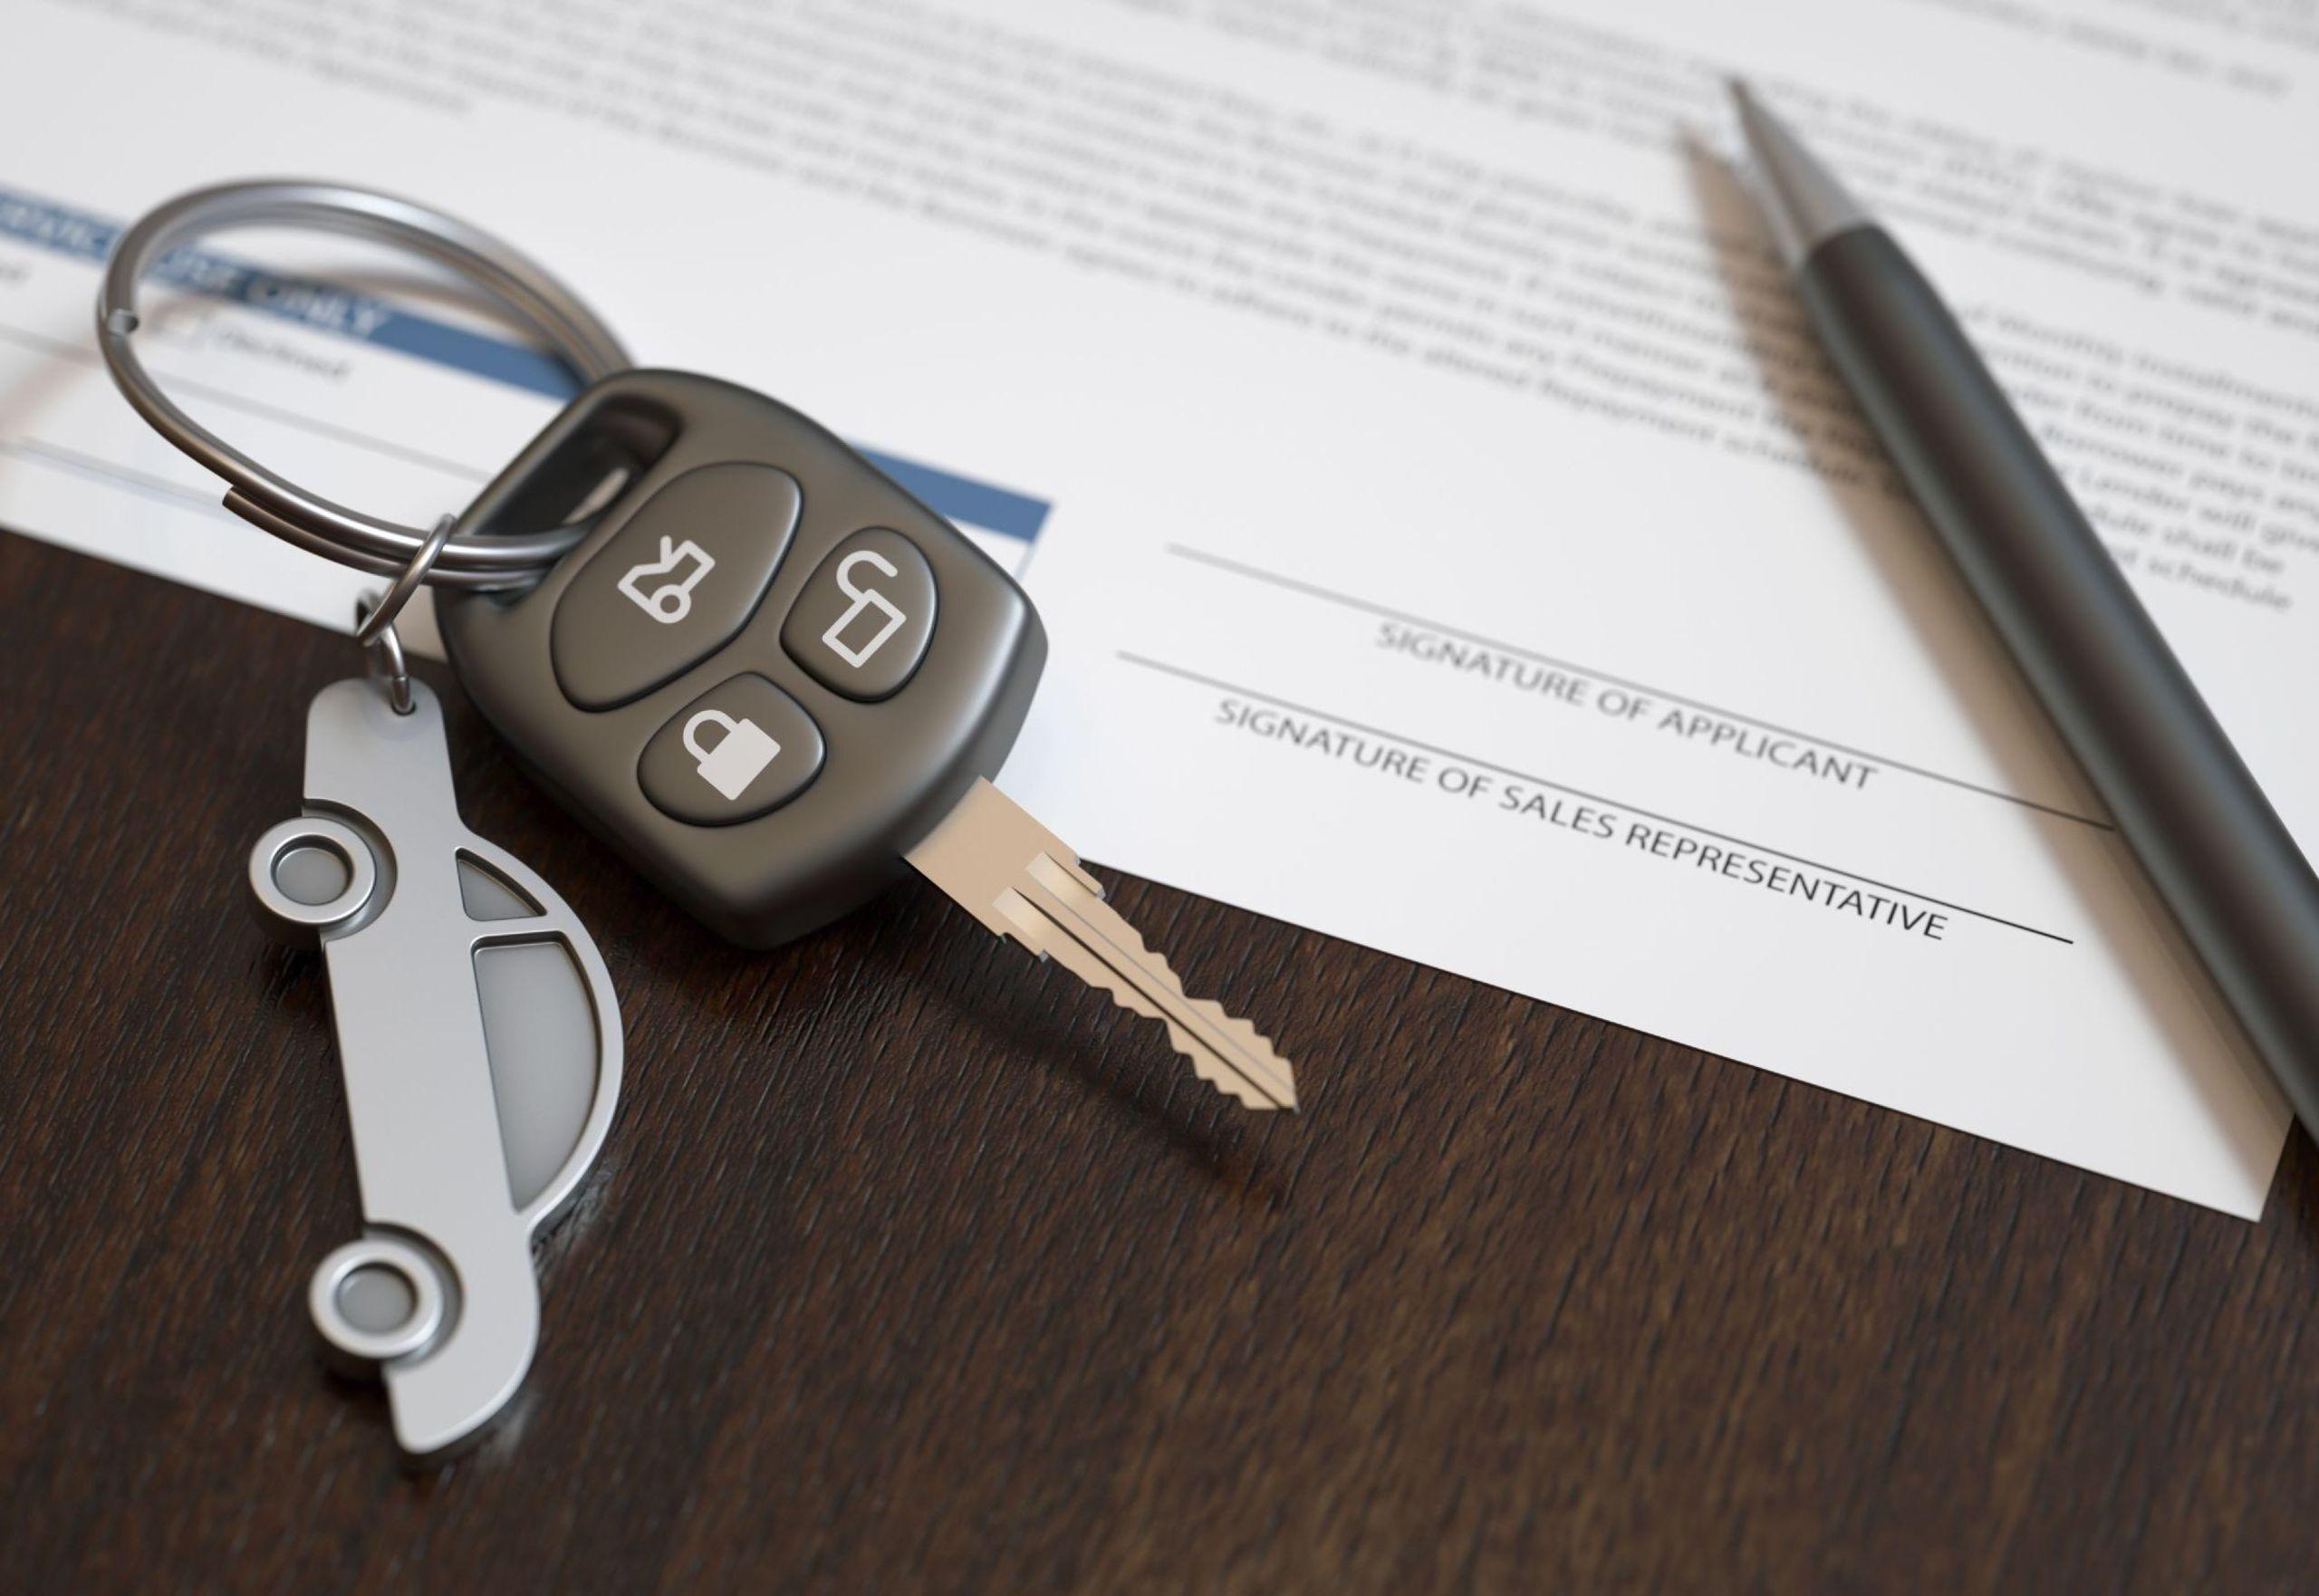 Kia Auto Loan Financing in Tallahassee FL Kia of Tallahassee